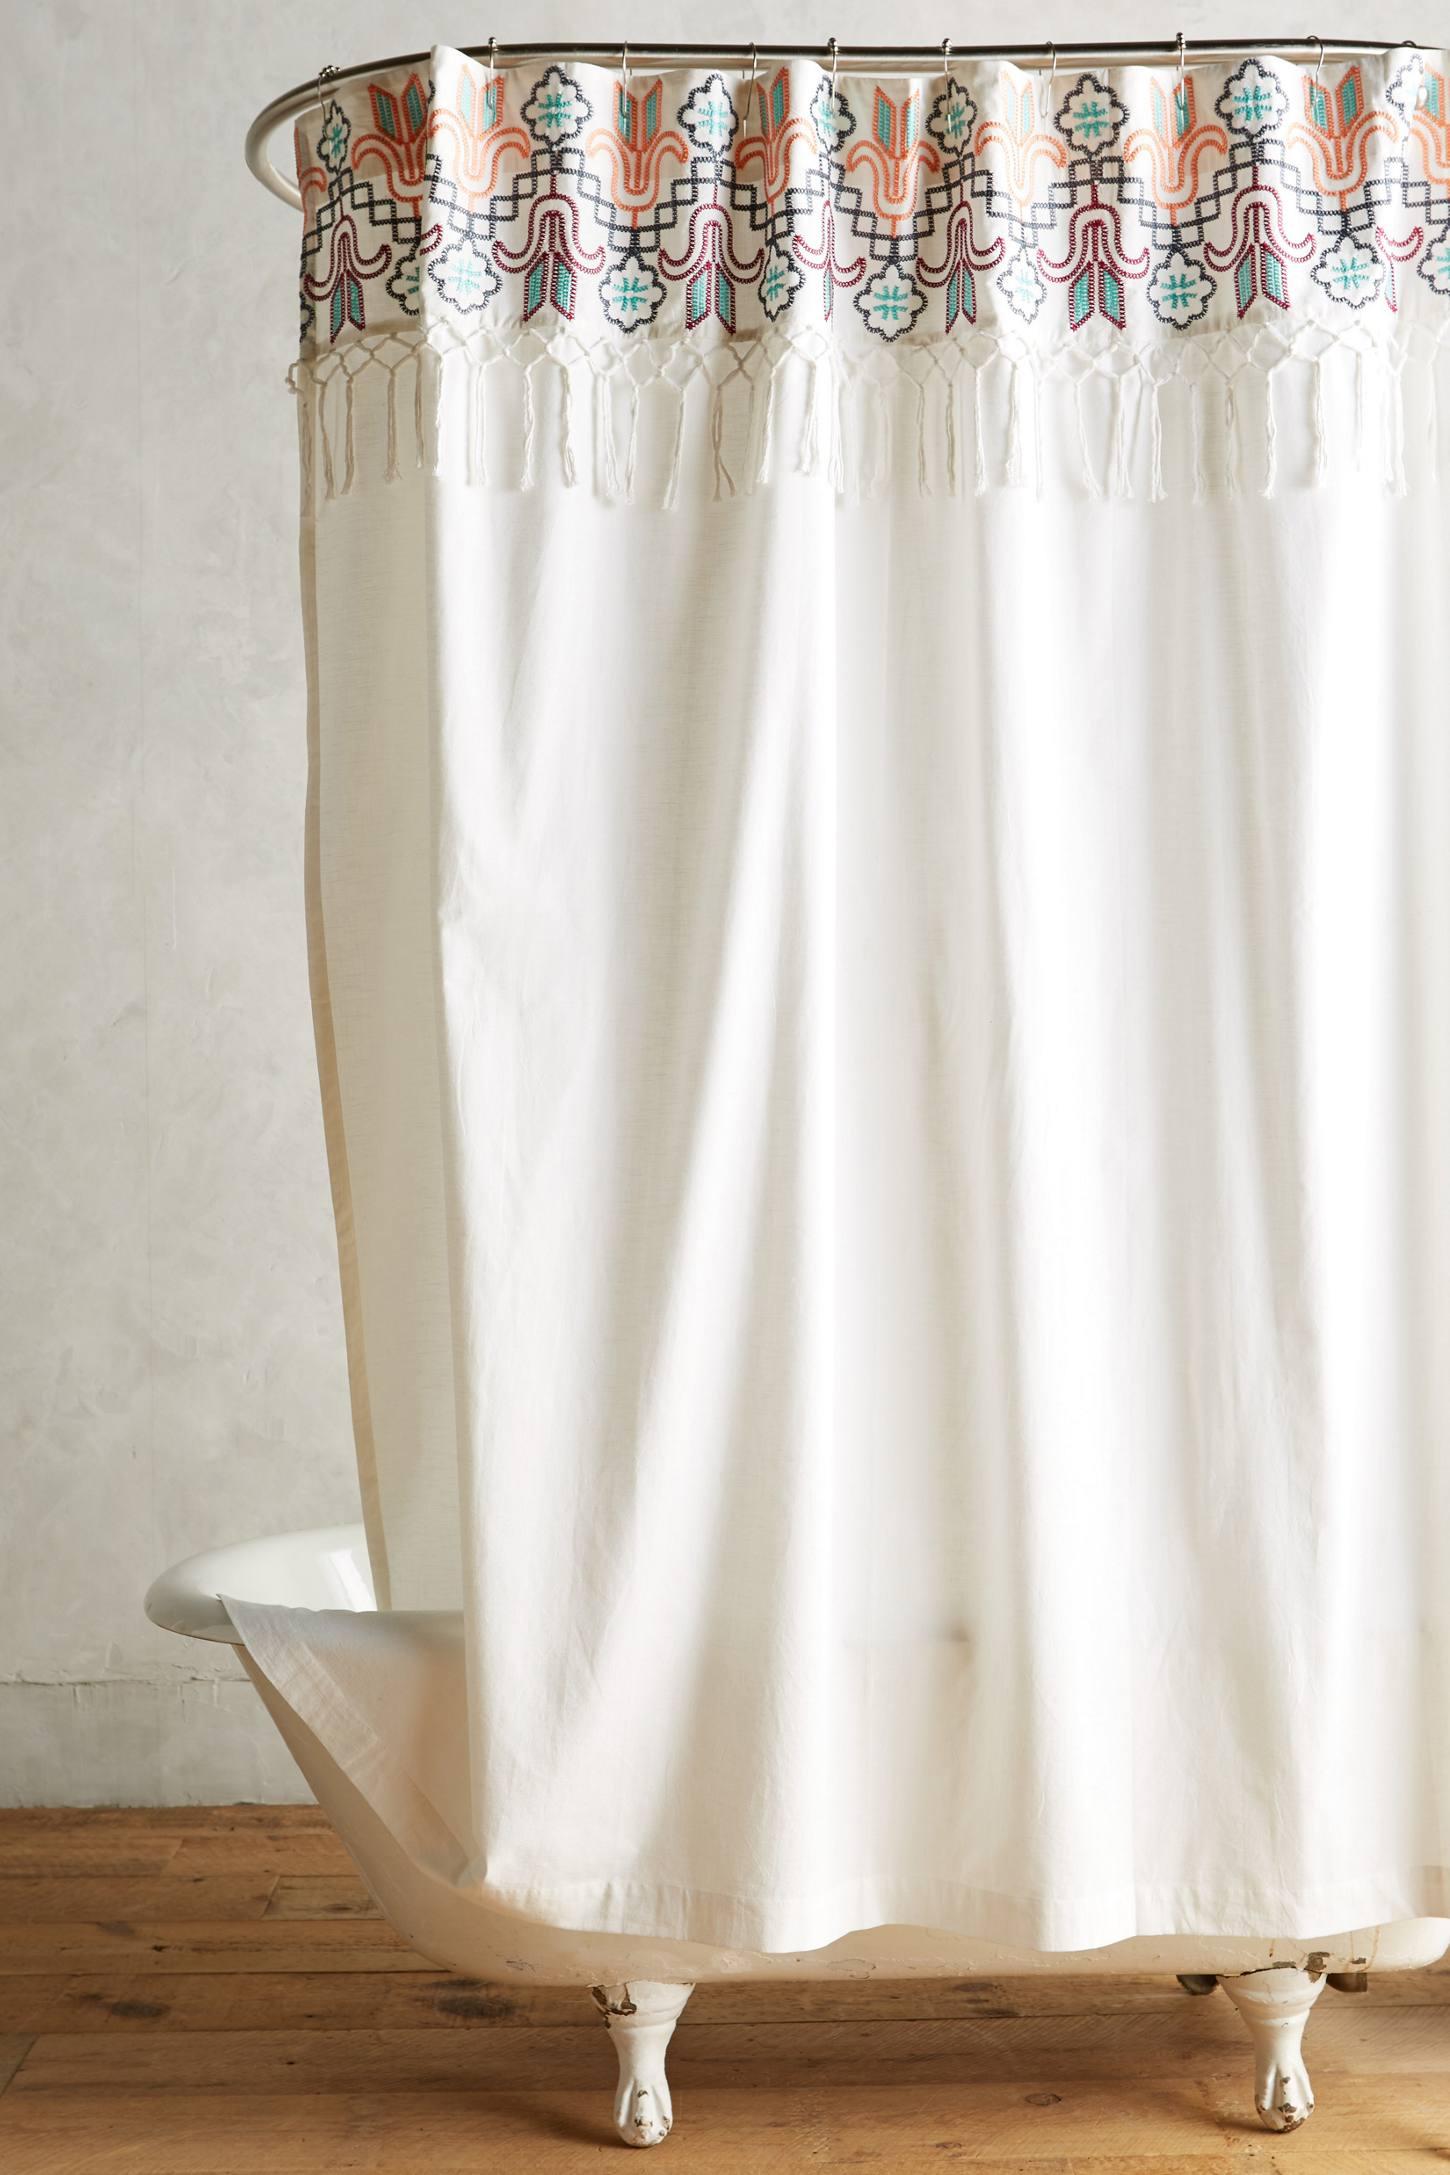 Kneeland Mercado Shower Curtain